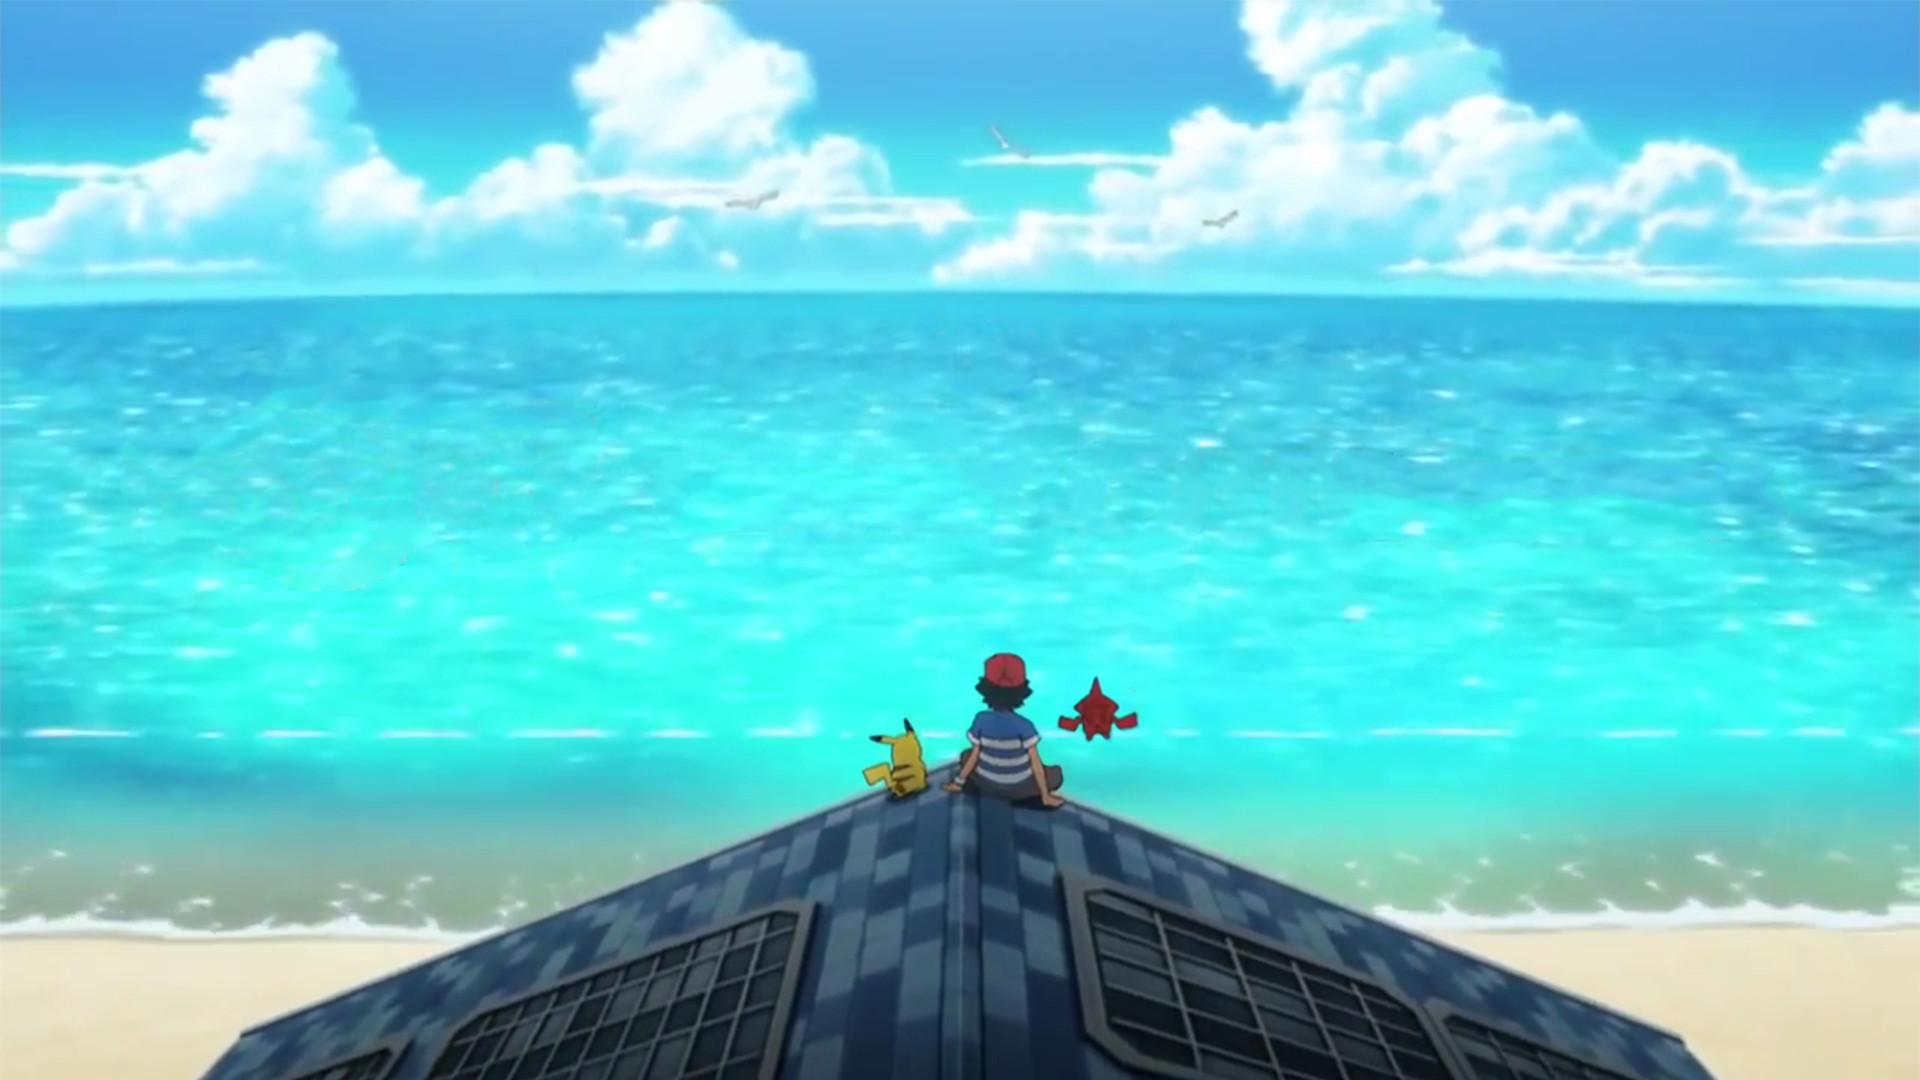 Pok̩mon: Sun & Moon РAnime Intro Wallpaper (1080p) (Scaled)